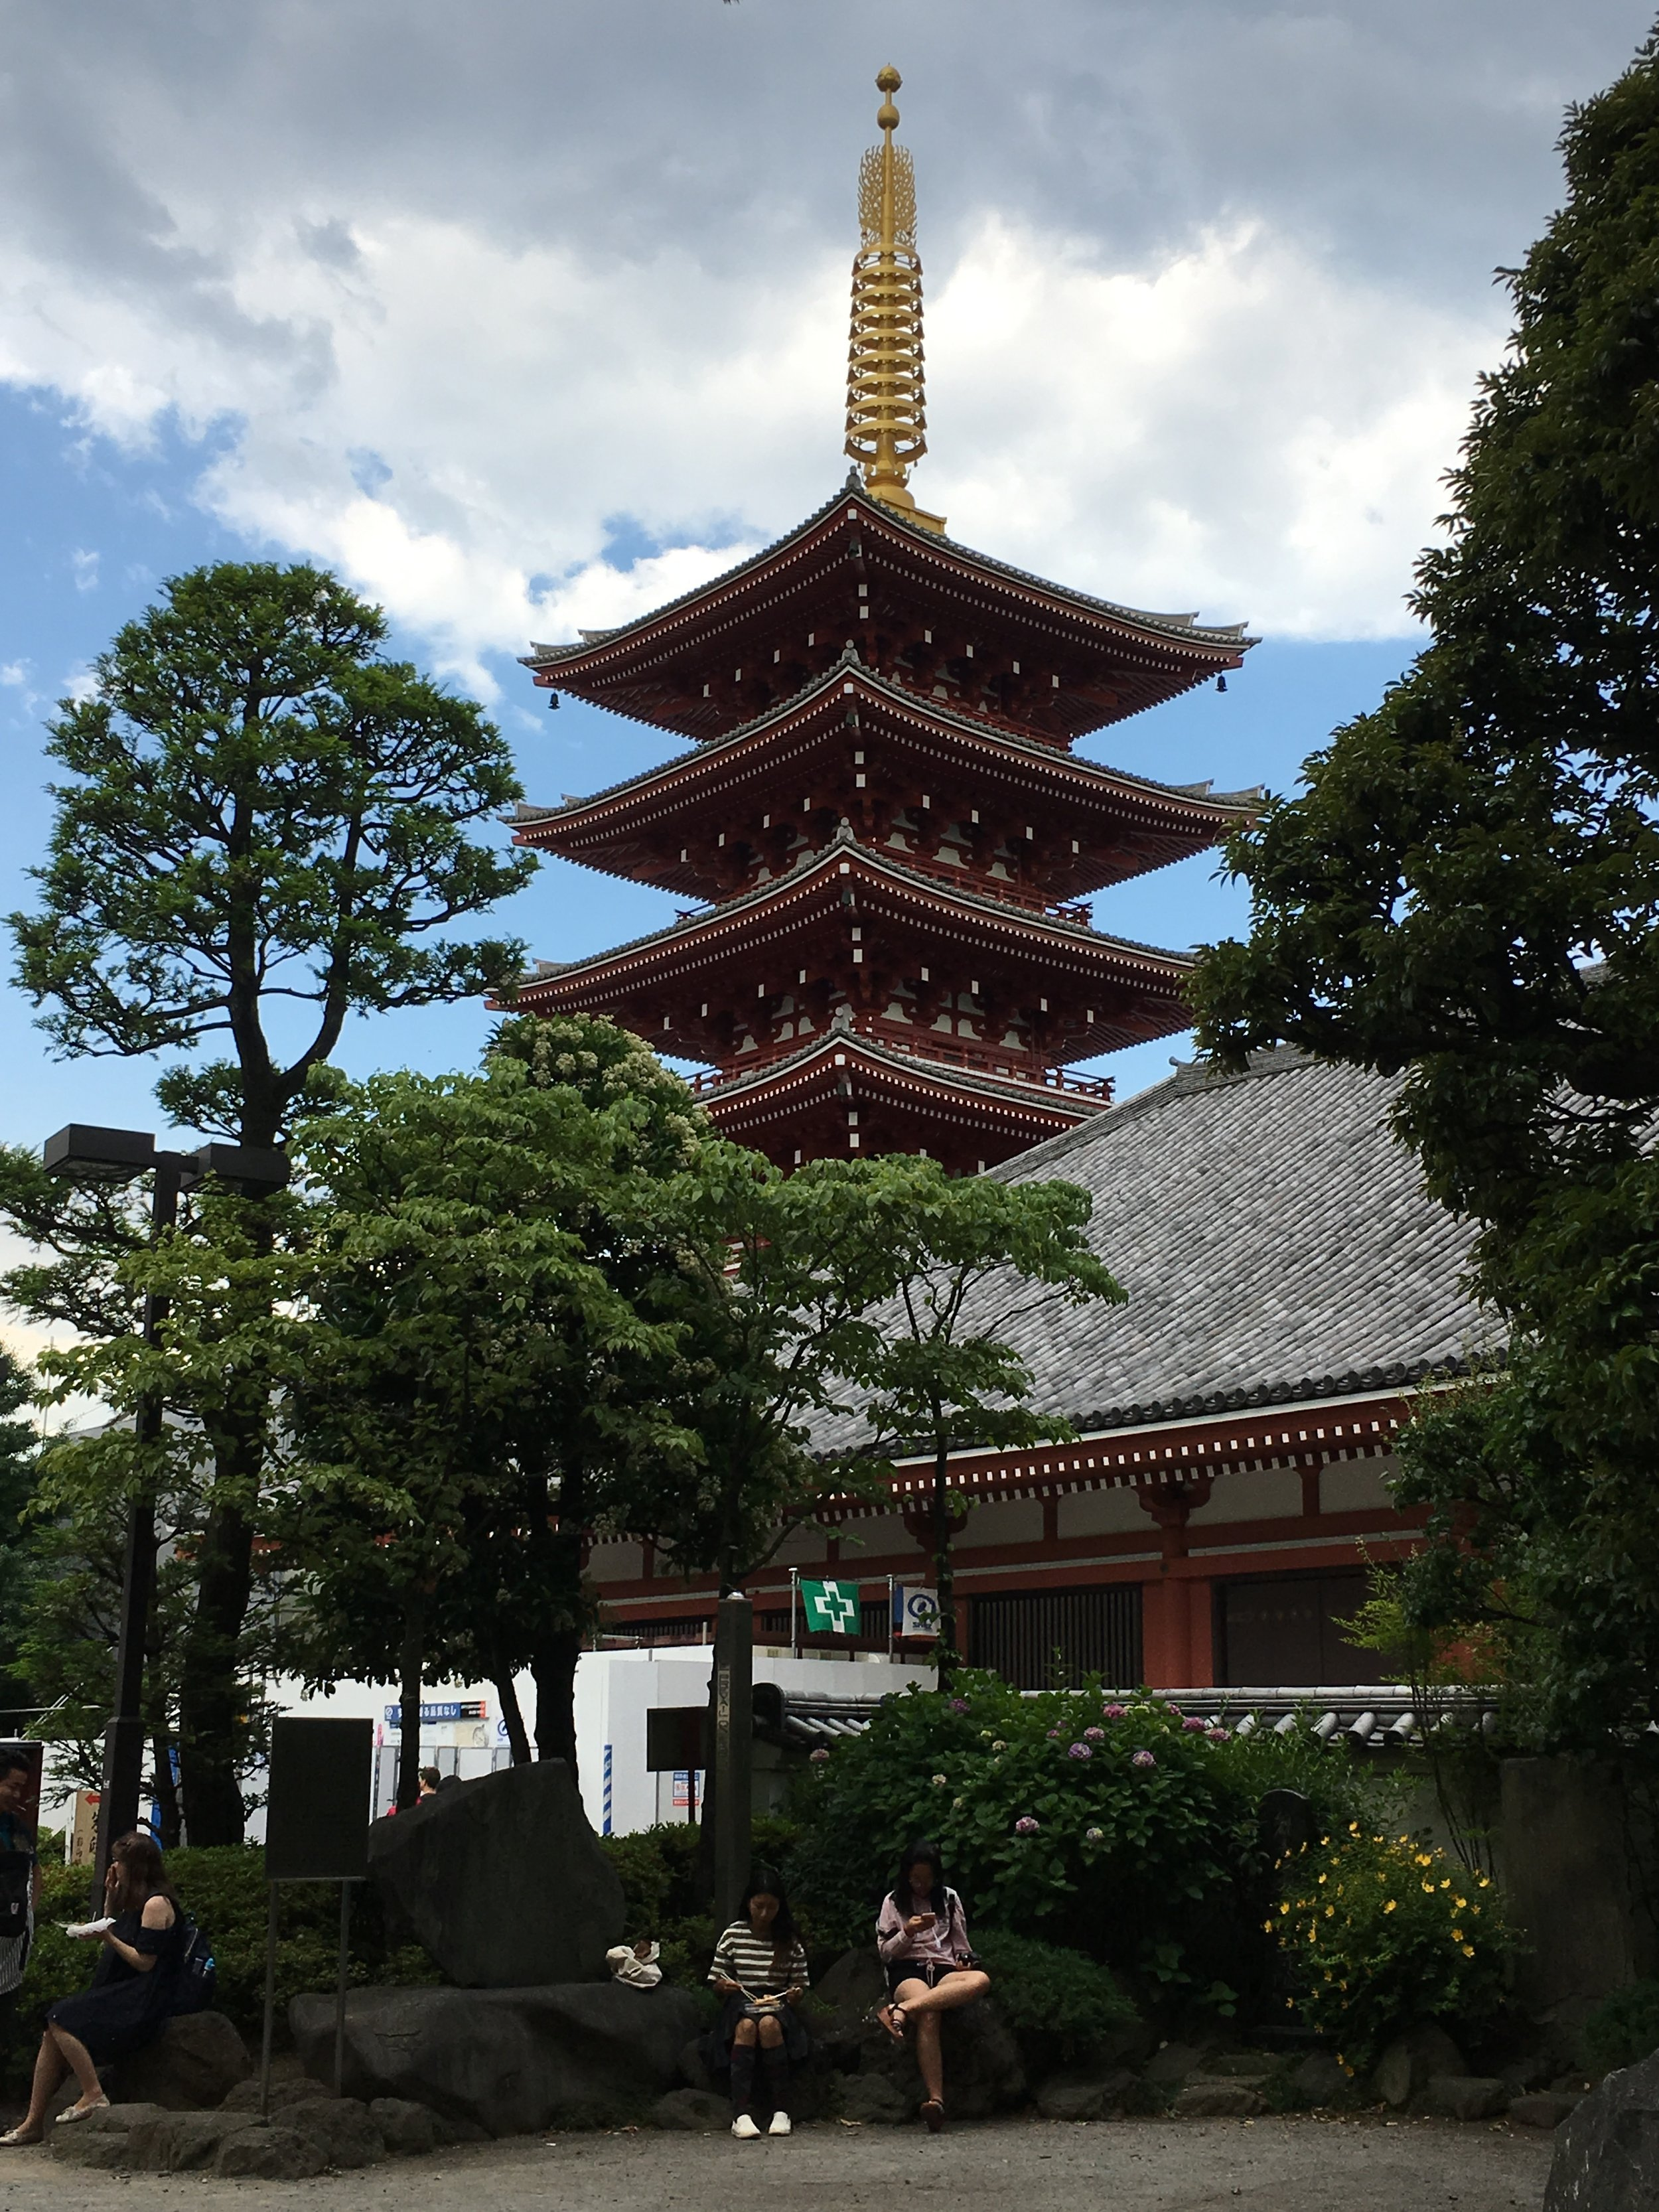 View of the Sensoji pagoda